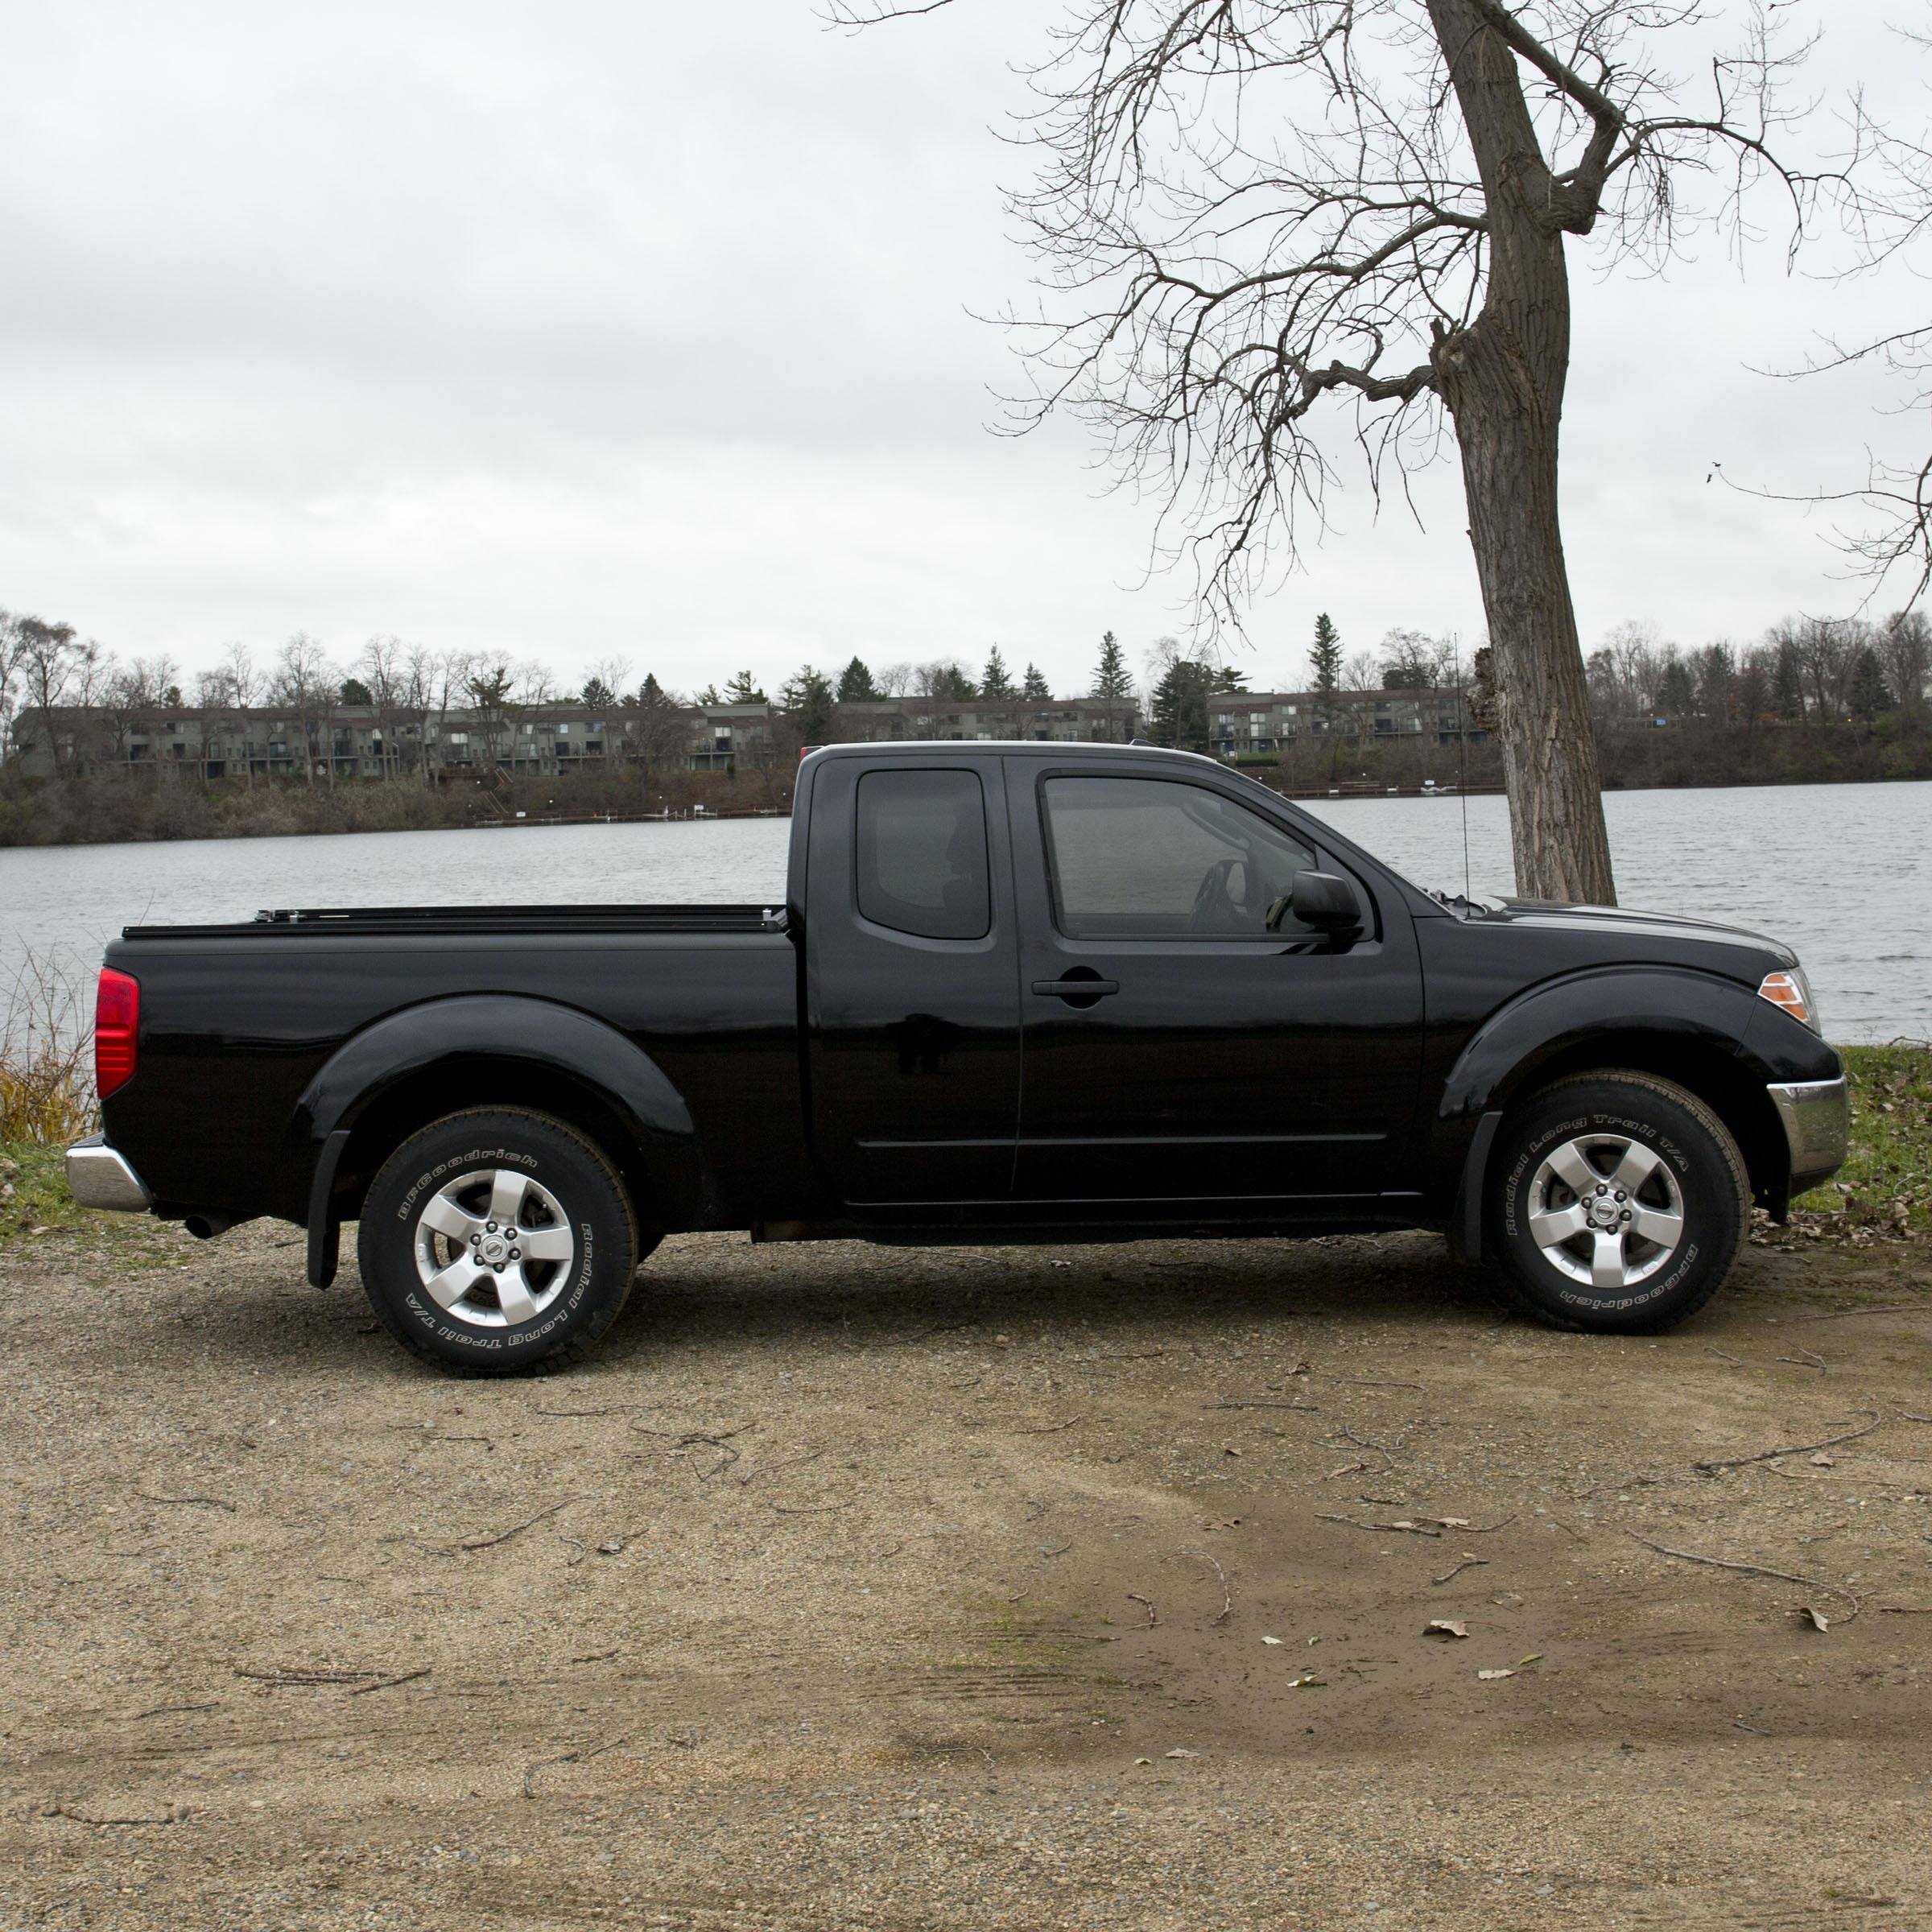 2011 Nissan Frontier Pick-Up Truck